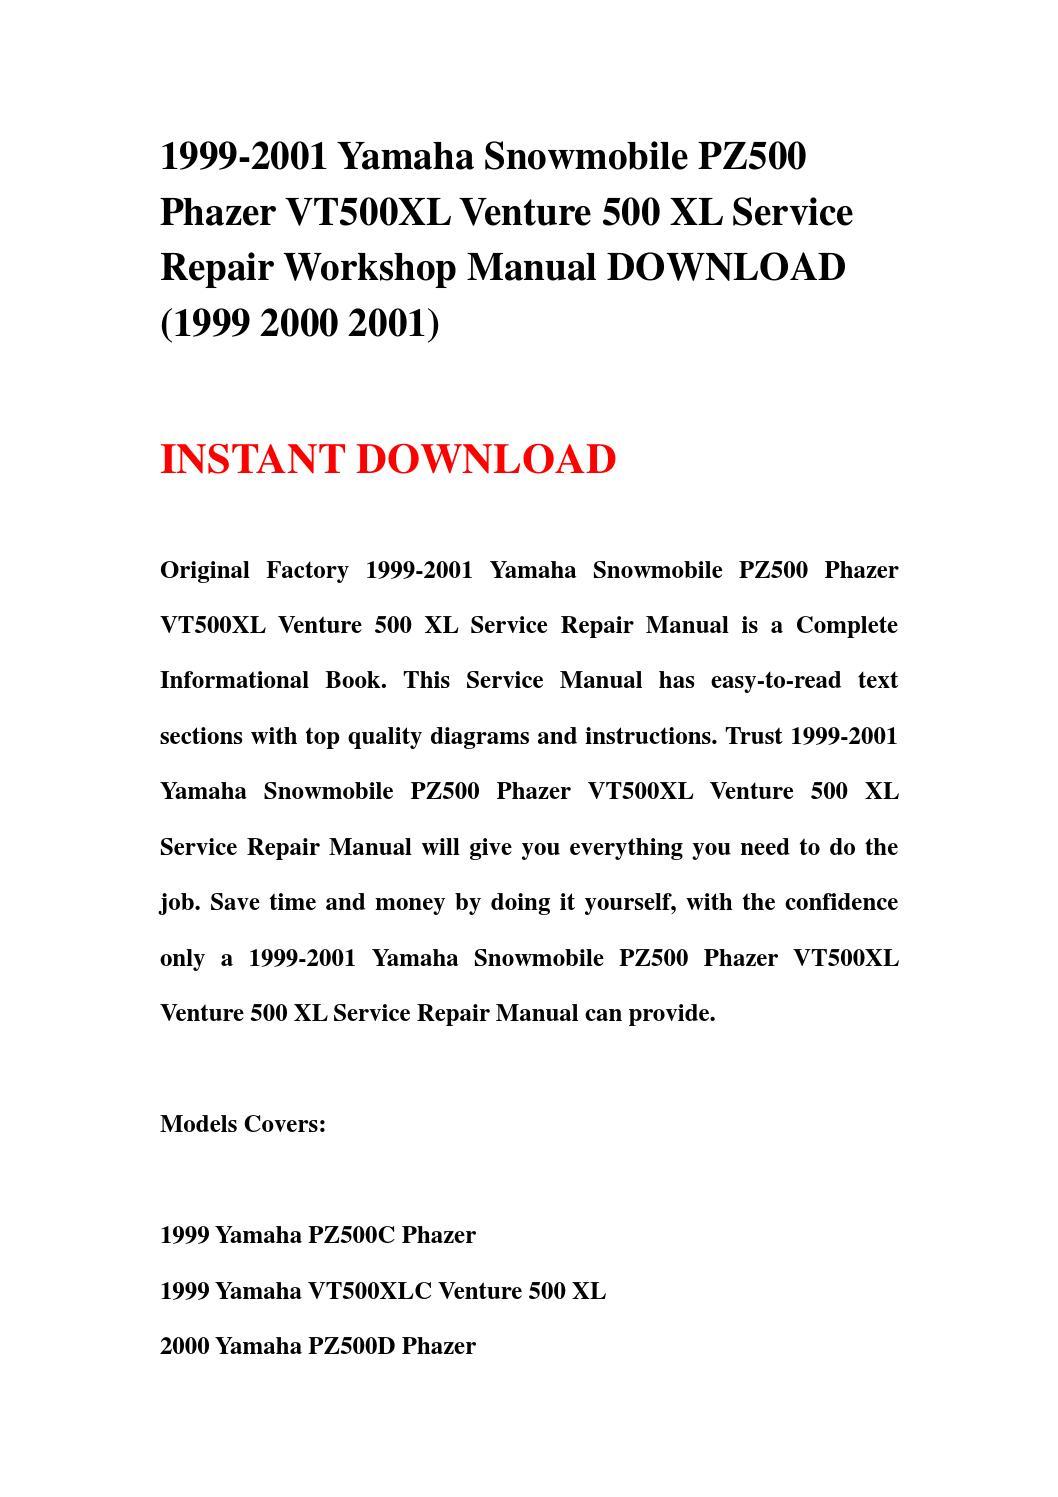 1999 2001 Yamaha Snowmobile Pz500 Phazer Vt500xl Venture